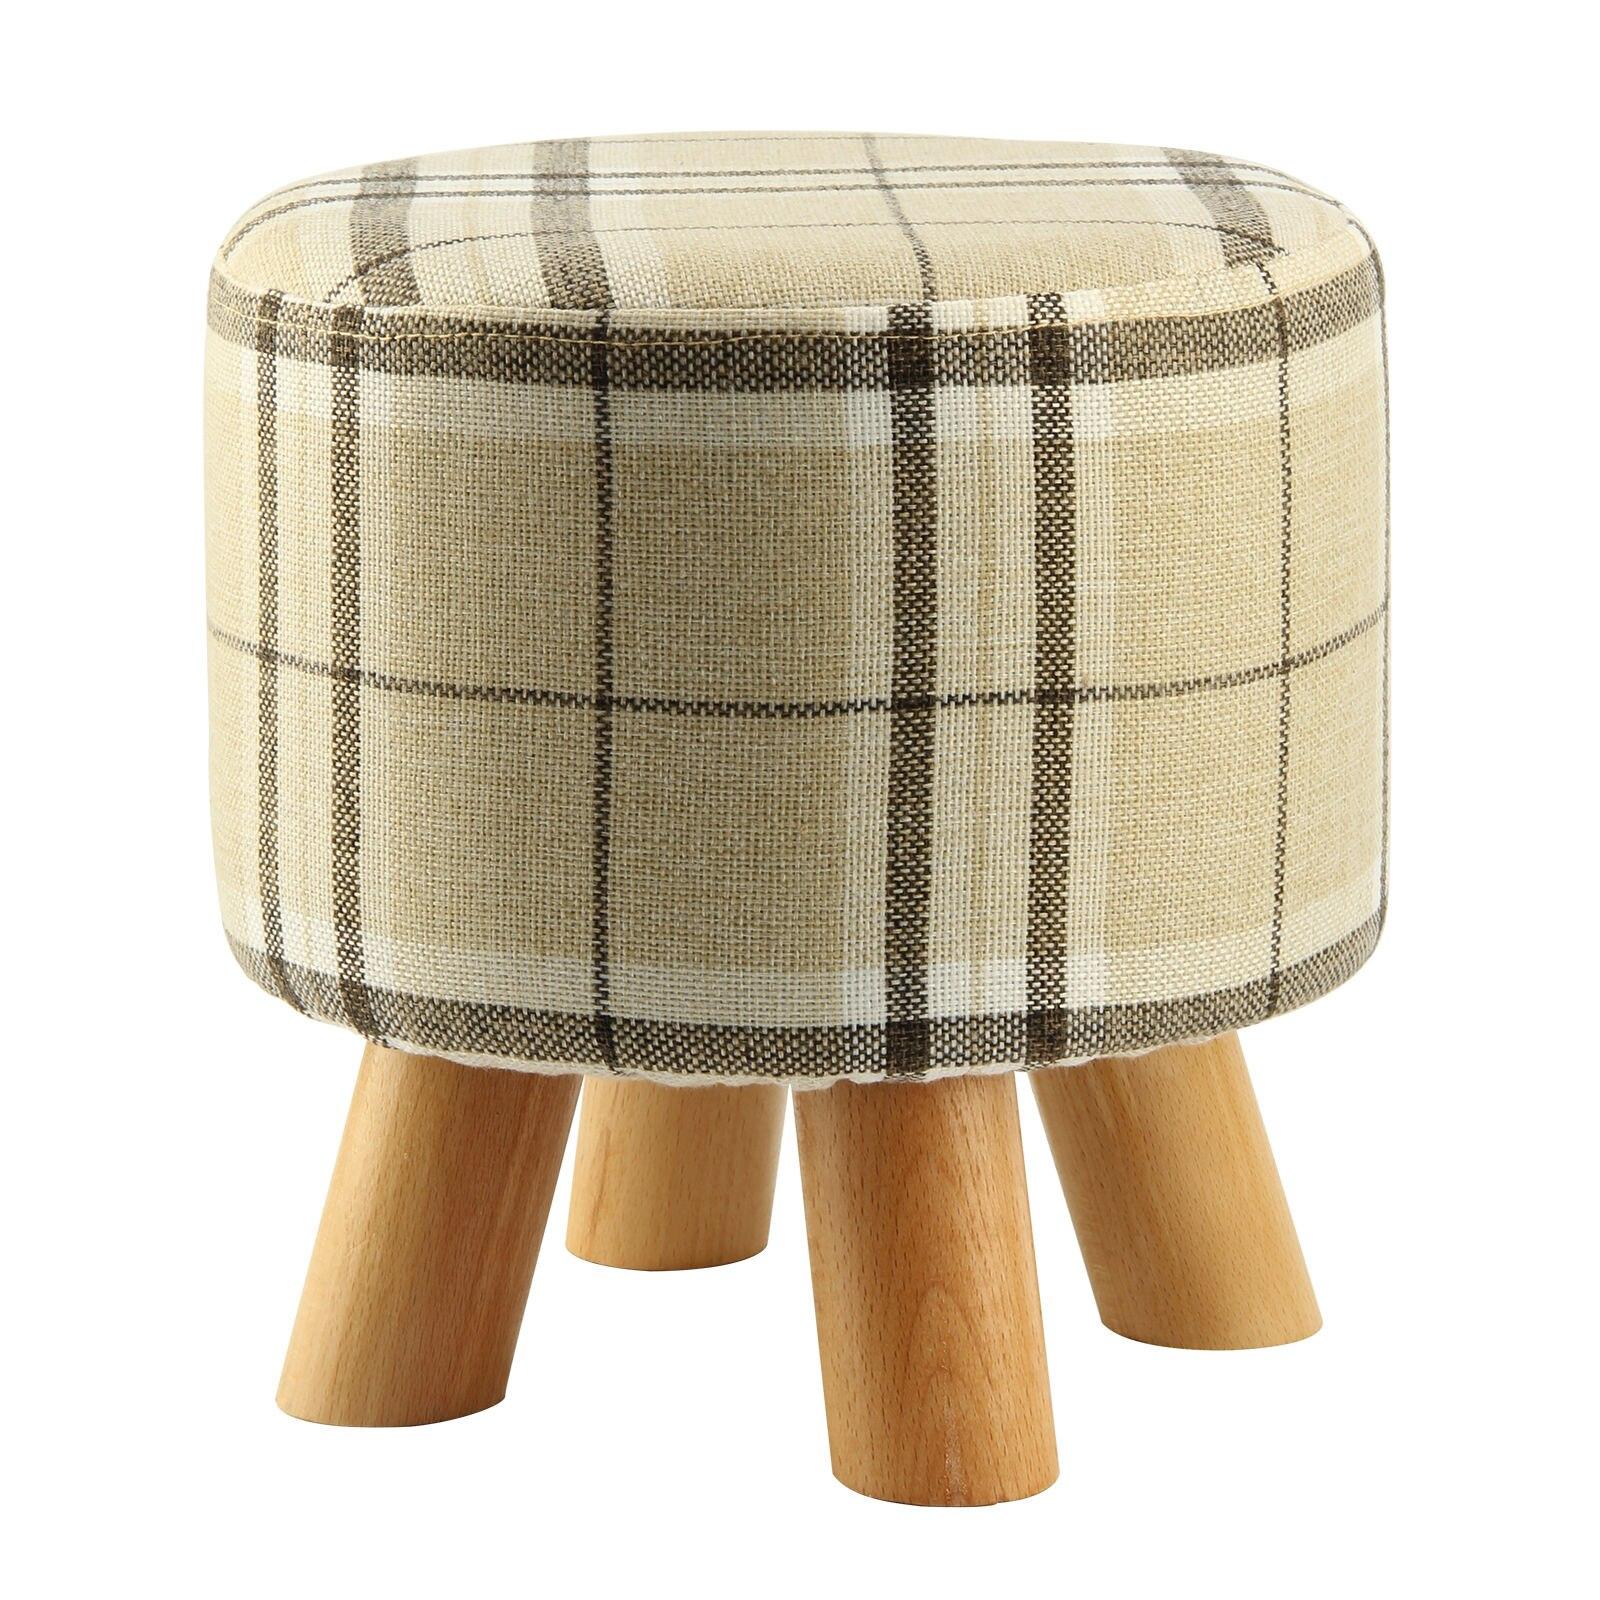 popular round fabric ottomanbuy cheap round fabric ottoman lots  - best modern luxury upholstered footstool round pouffe stool  wooden legpatternround fabric